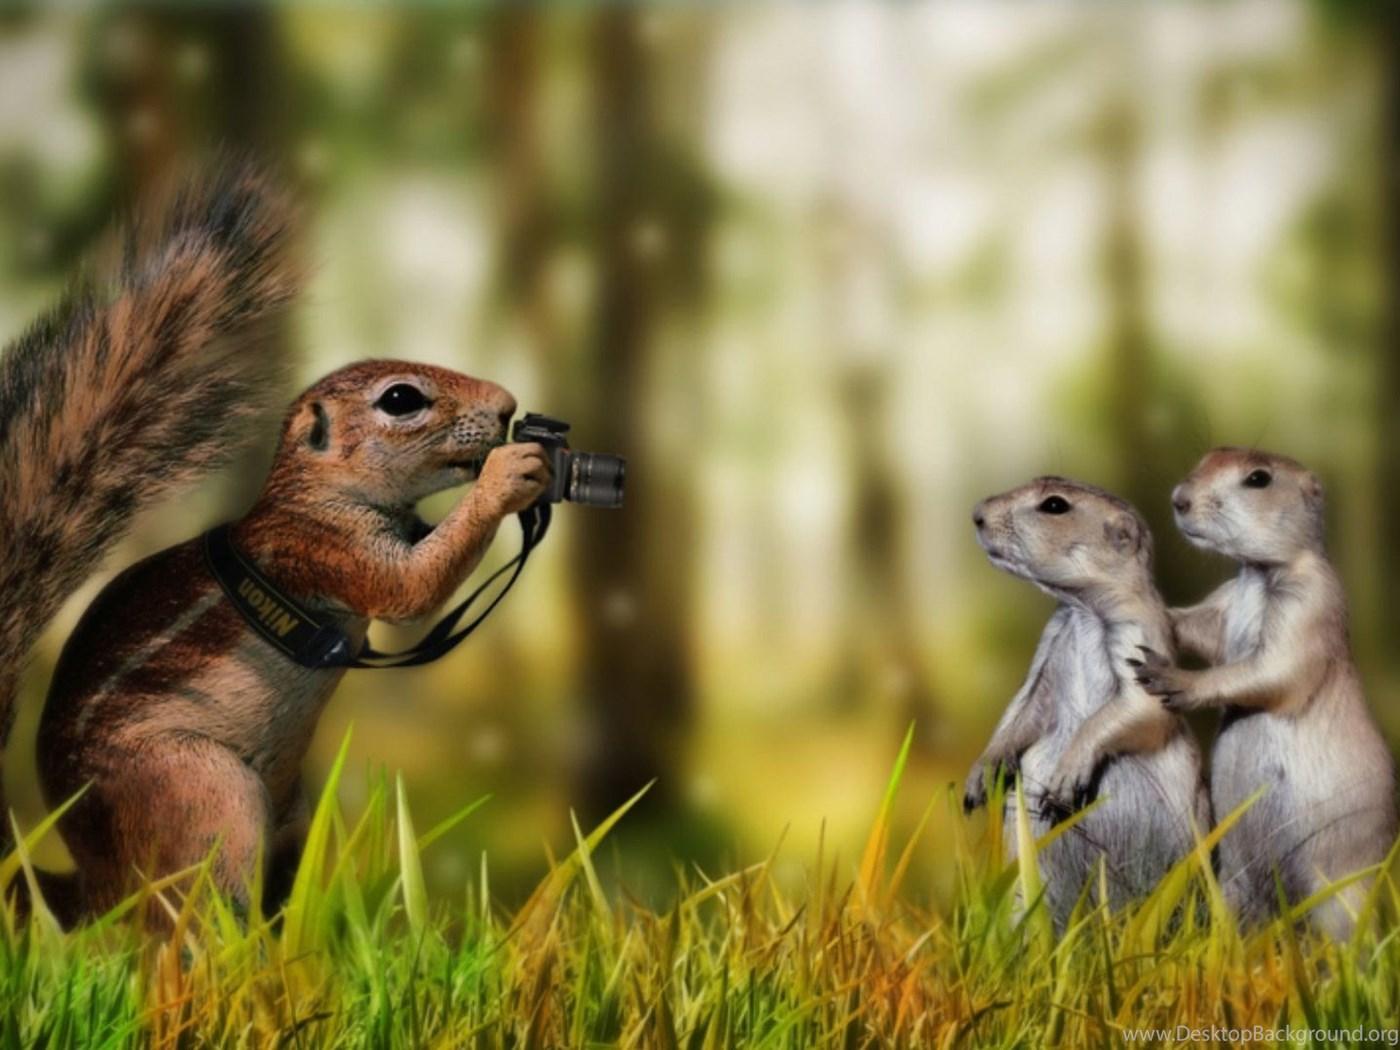 Very funny squirrel wallpapers hd desktop wallpapers - Funny squirrel backgrounds ...